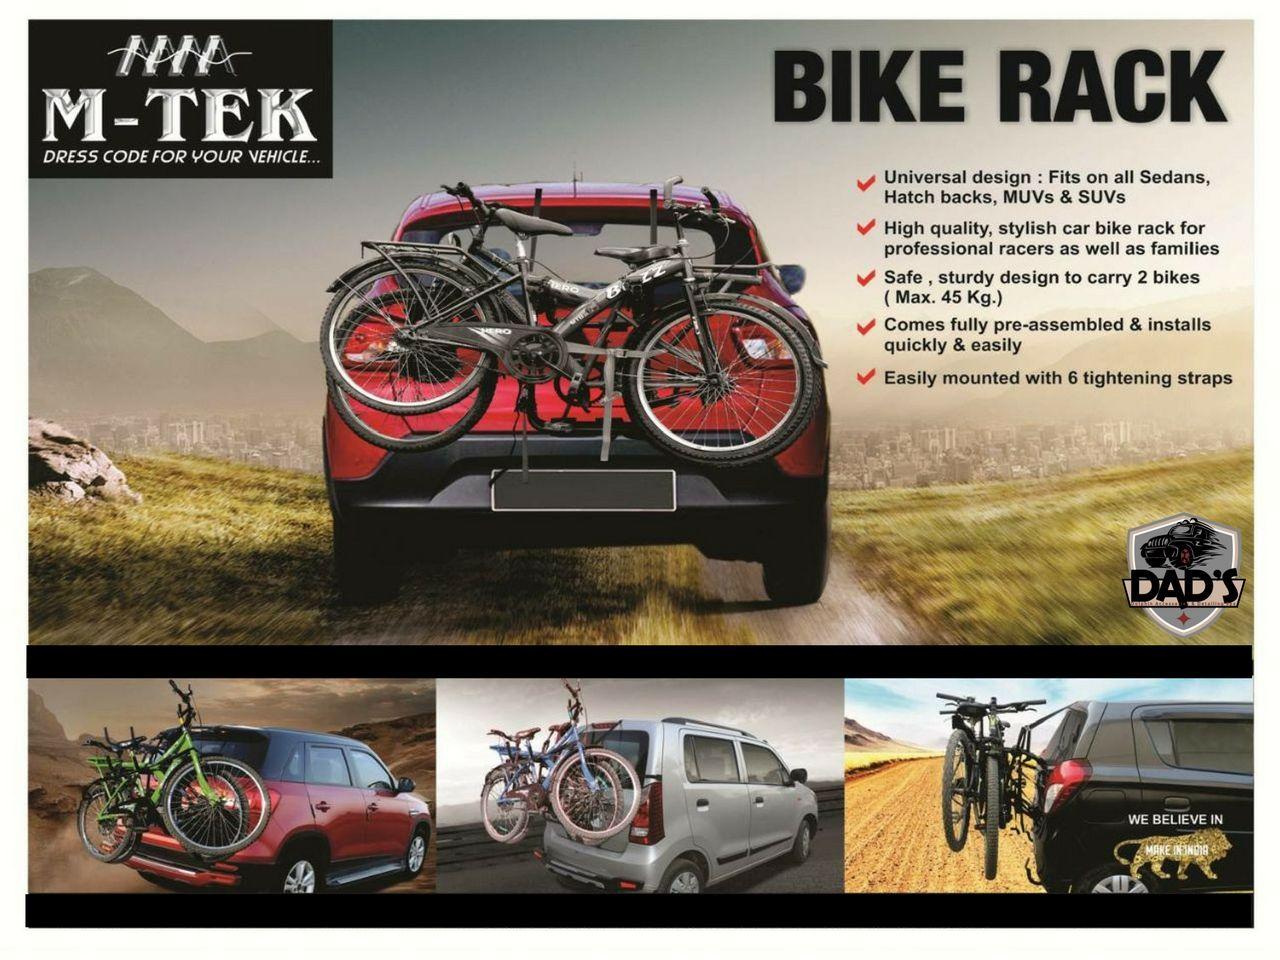 Introducing mtek bike rack for all cars carry 2 bikes